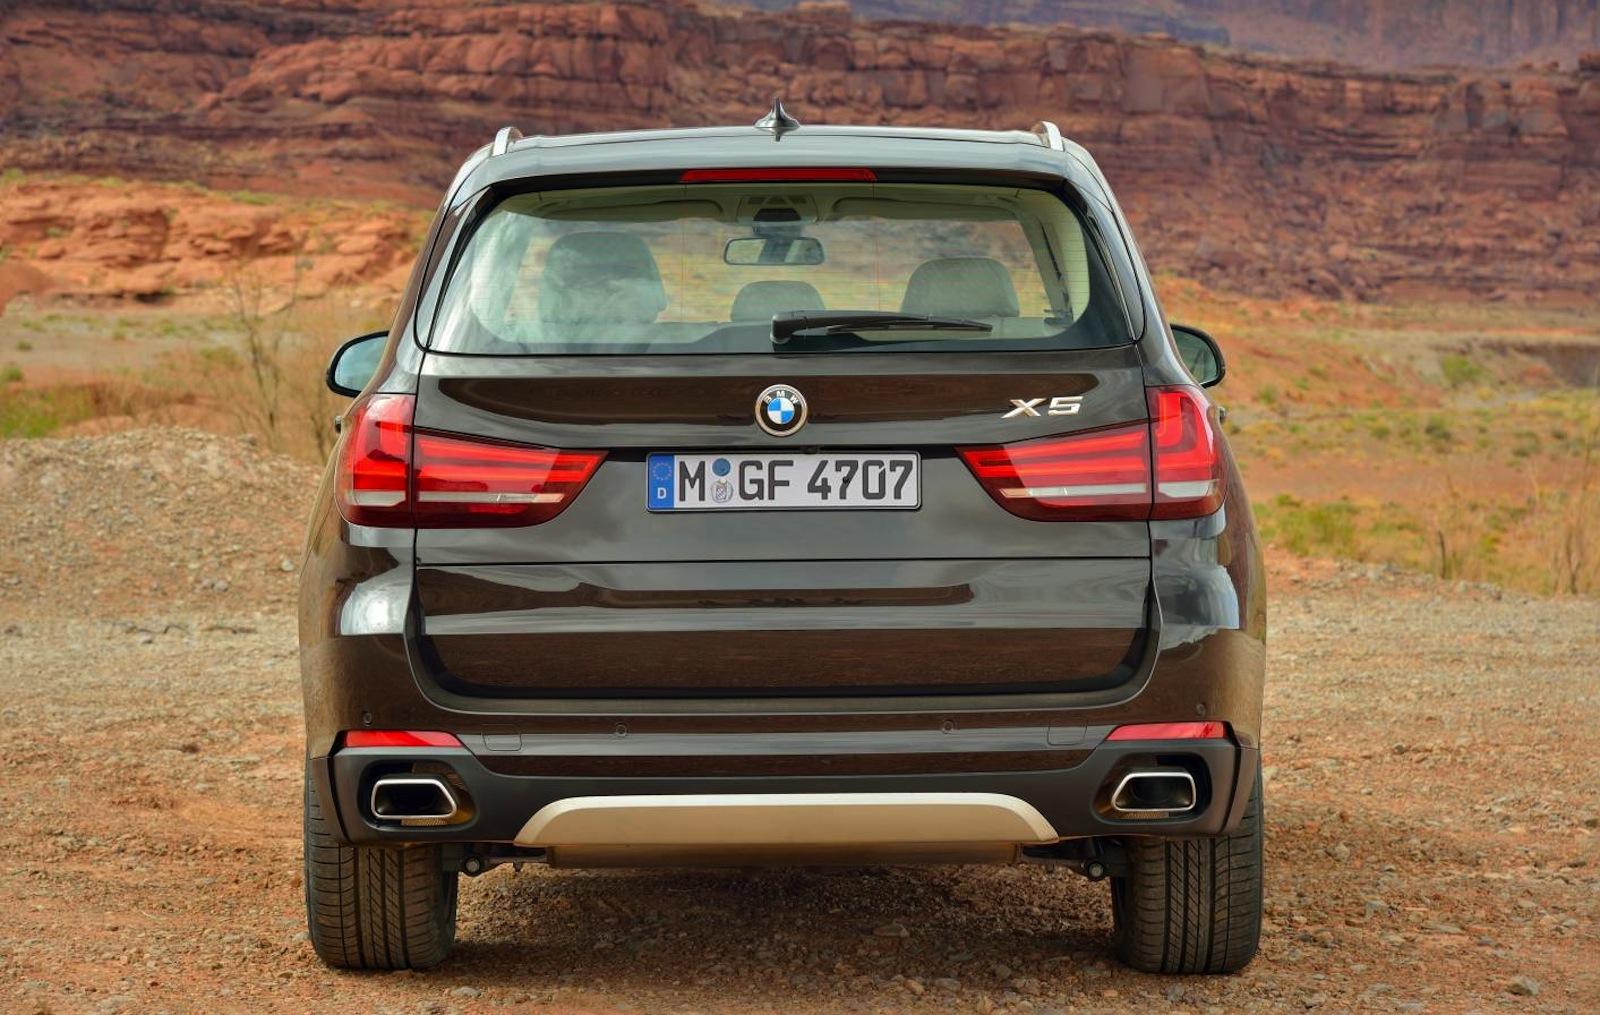 Ford Suv Models >> BMW X5: rear-wheel drive for third-gen luxury SUV - photos ...